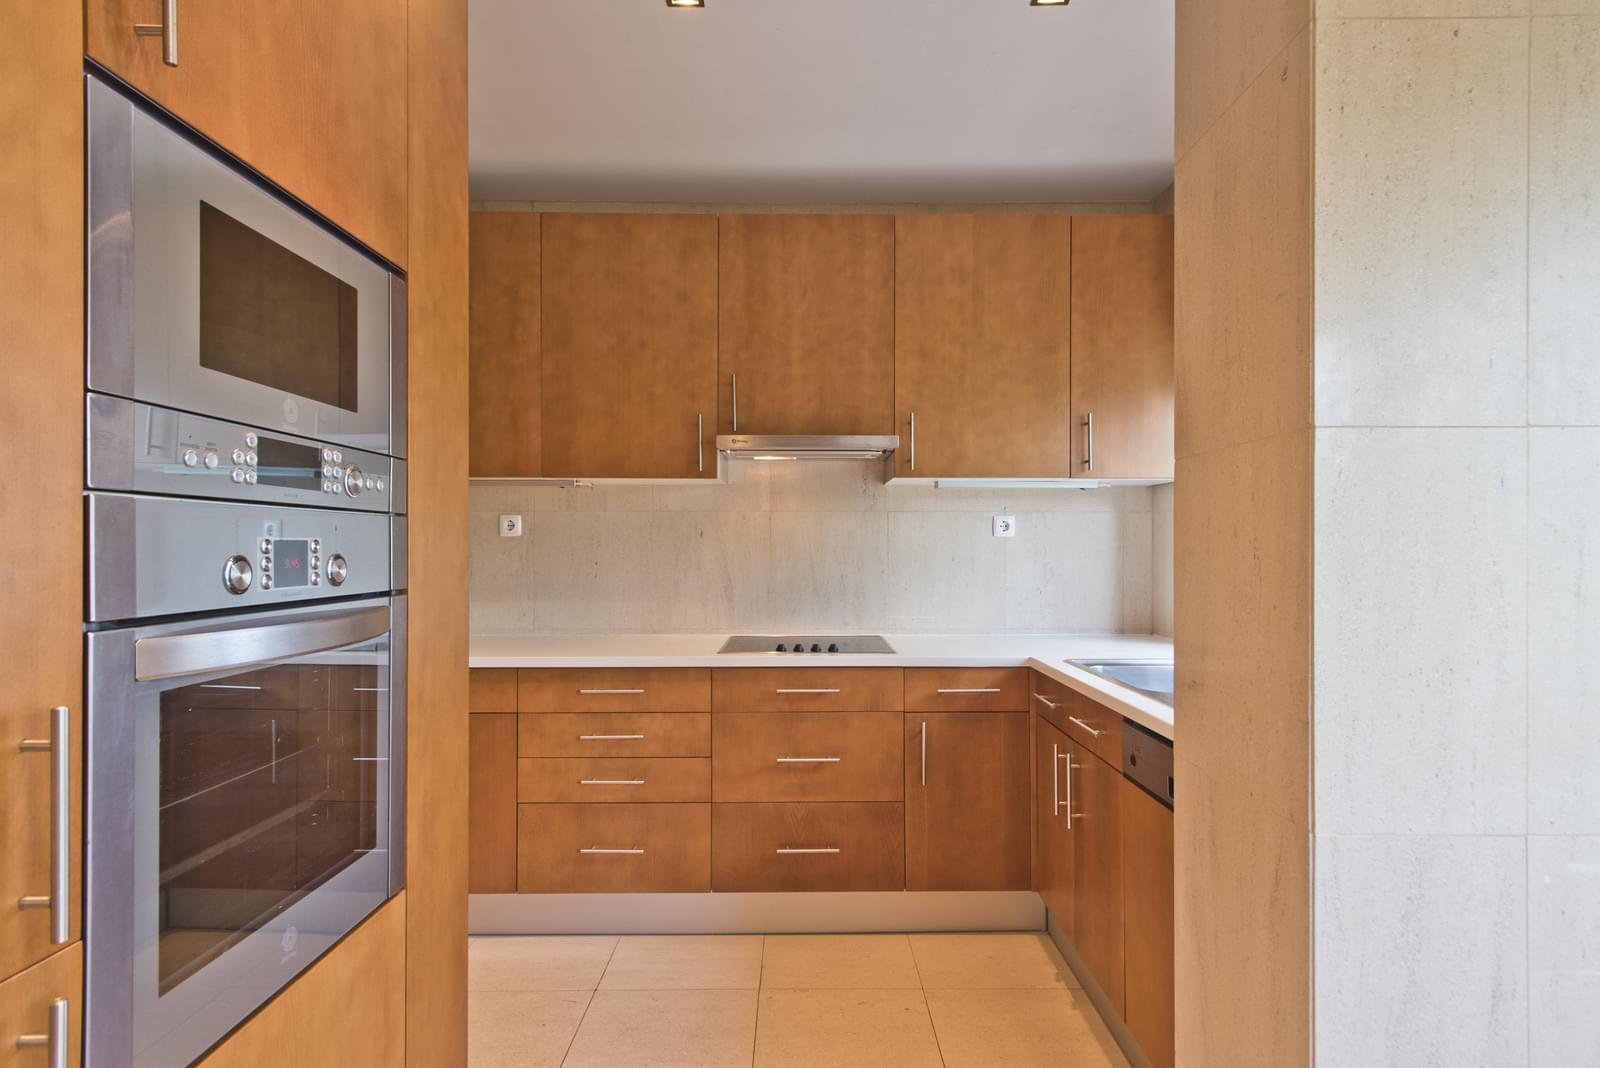 pf17006-apartamento-t1-cascais-d5a5cc7b-d804-4b33-b6b9-f4ec2eb1fc96